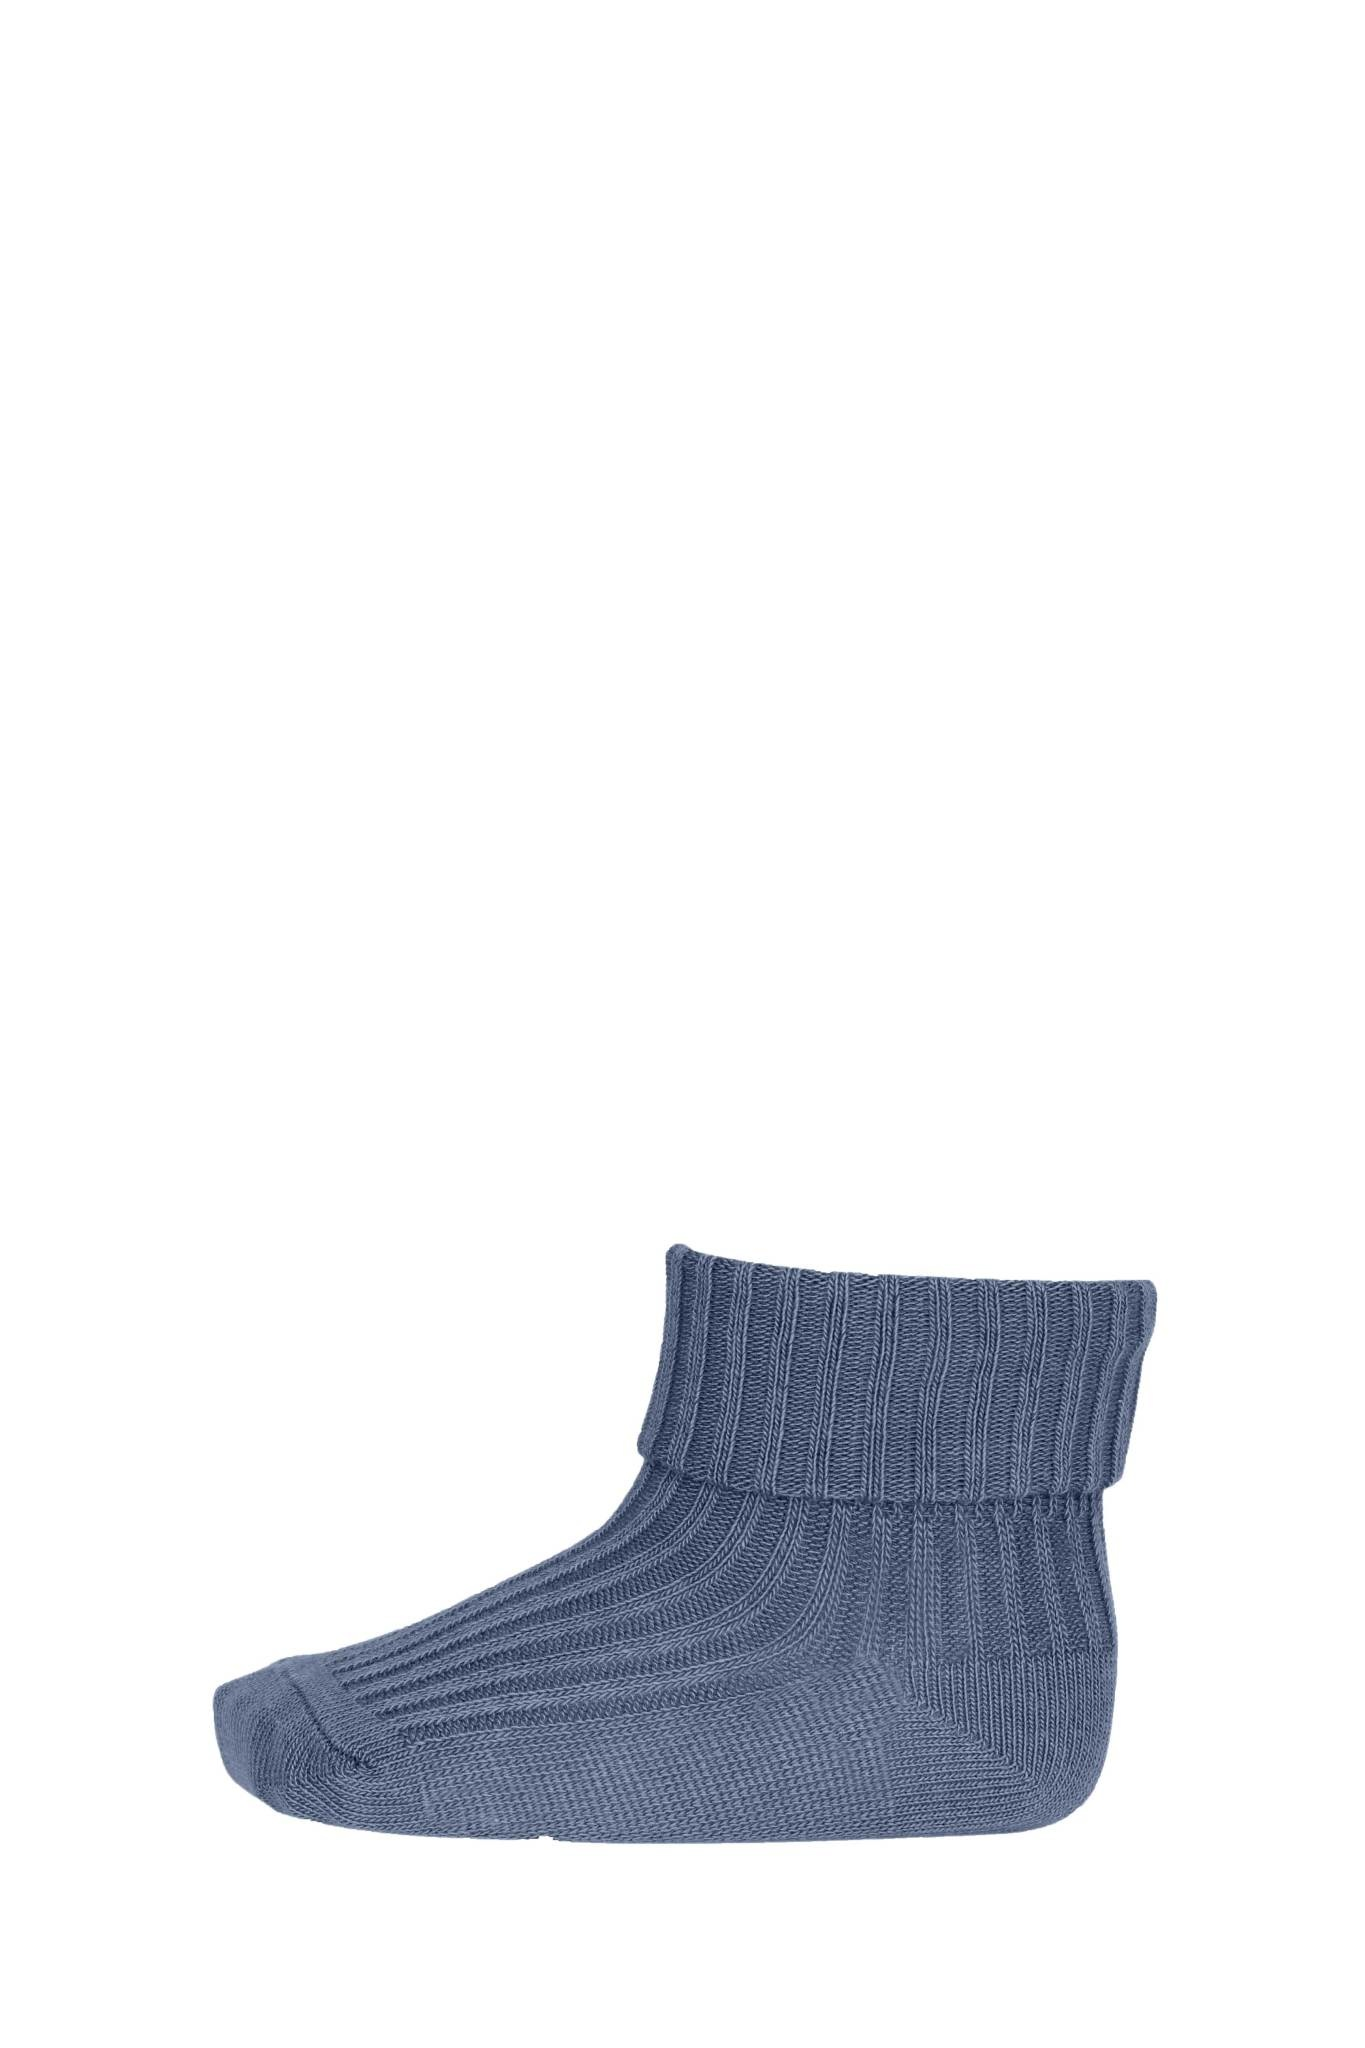 MP Denmark cotton rib sokjes - 4222 stone blue-1